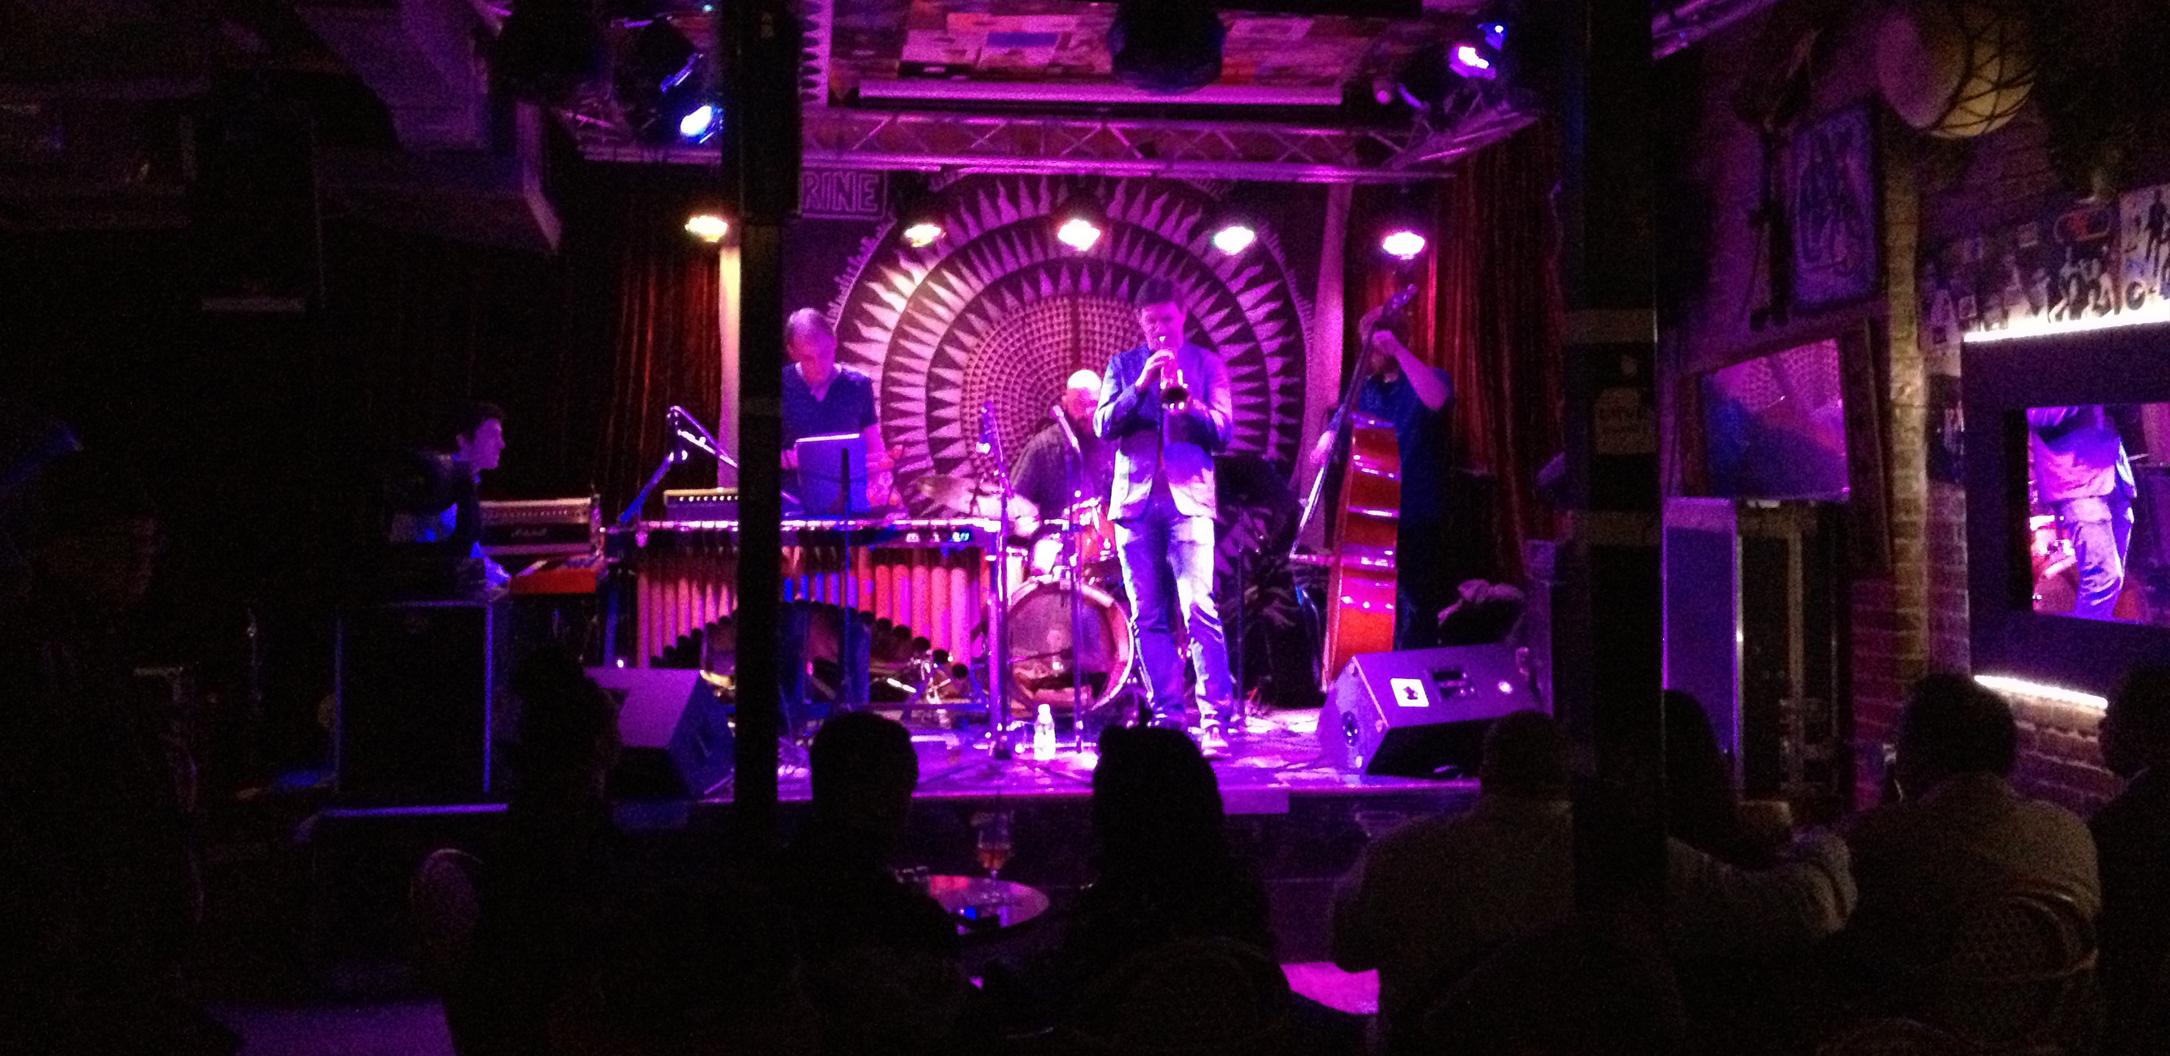 Thomas Heflin Quintet at The Shrine, Harlem, NYC, 2013